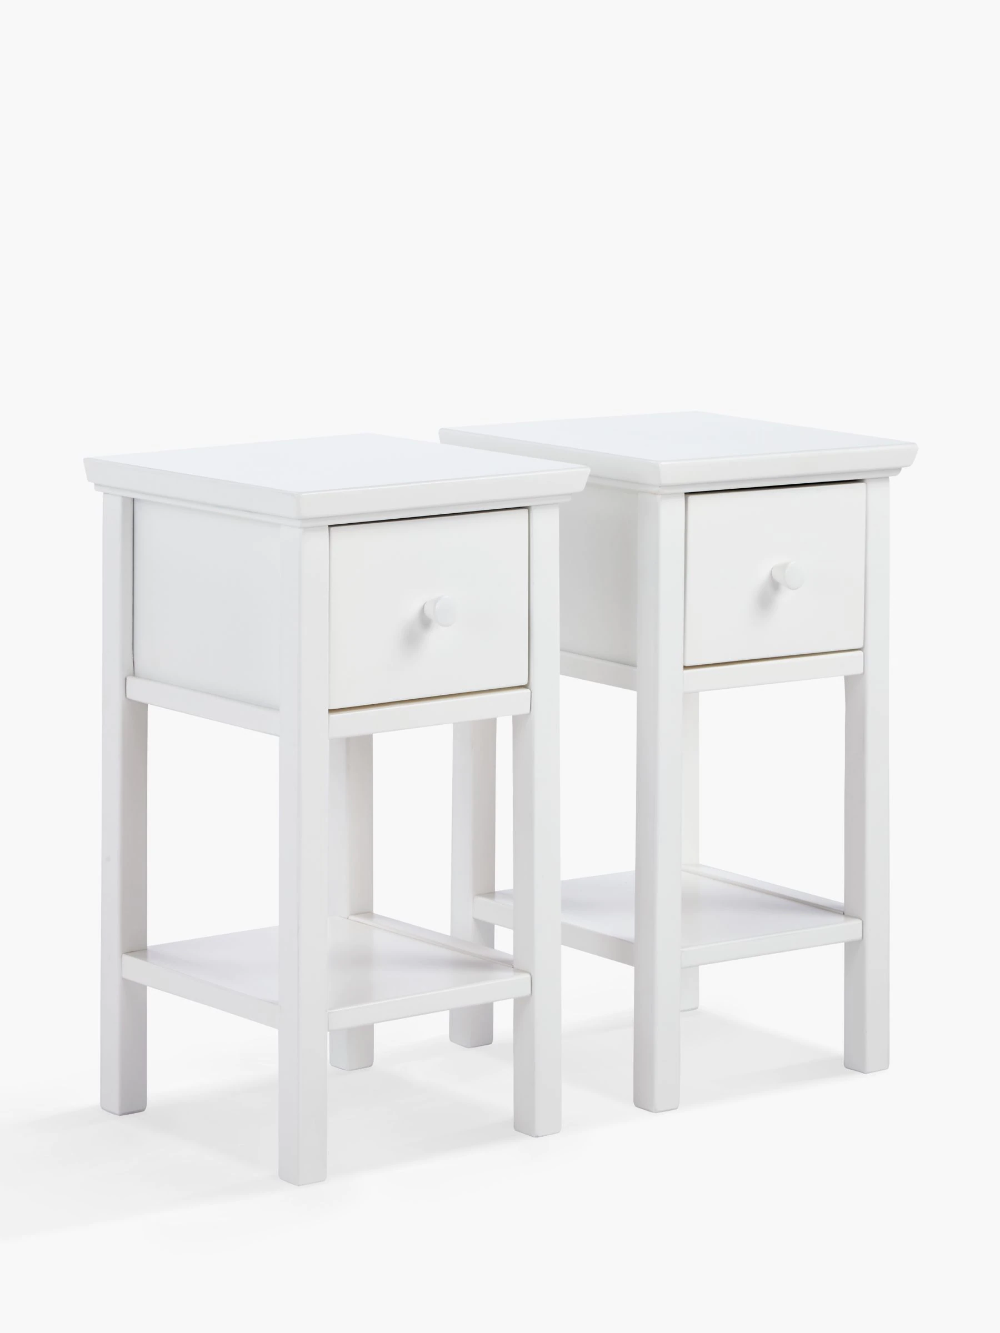 Best John Lewis Partners Wilton Bedside Tables Set Of 2 400 x 300